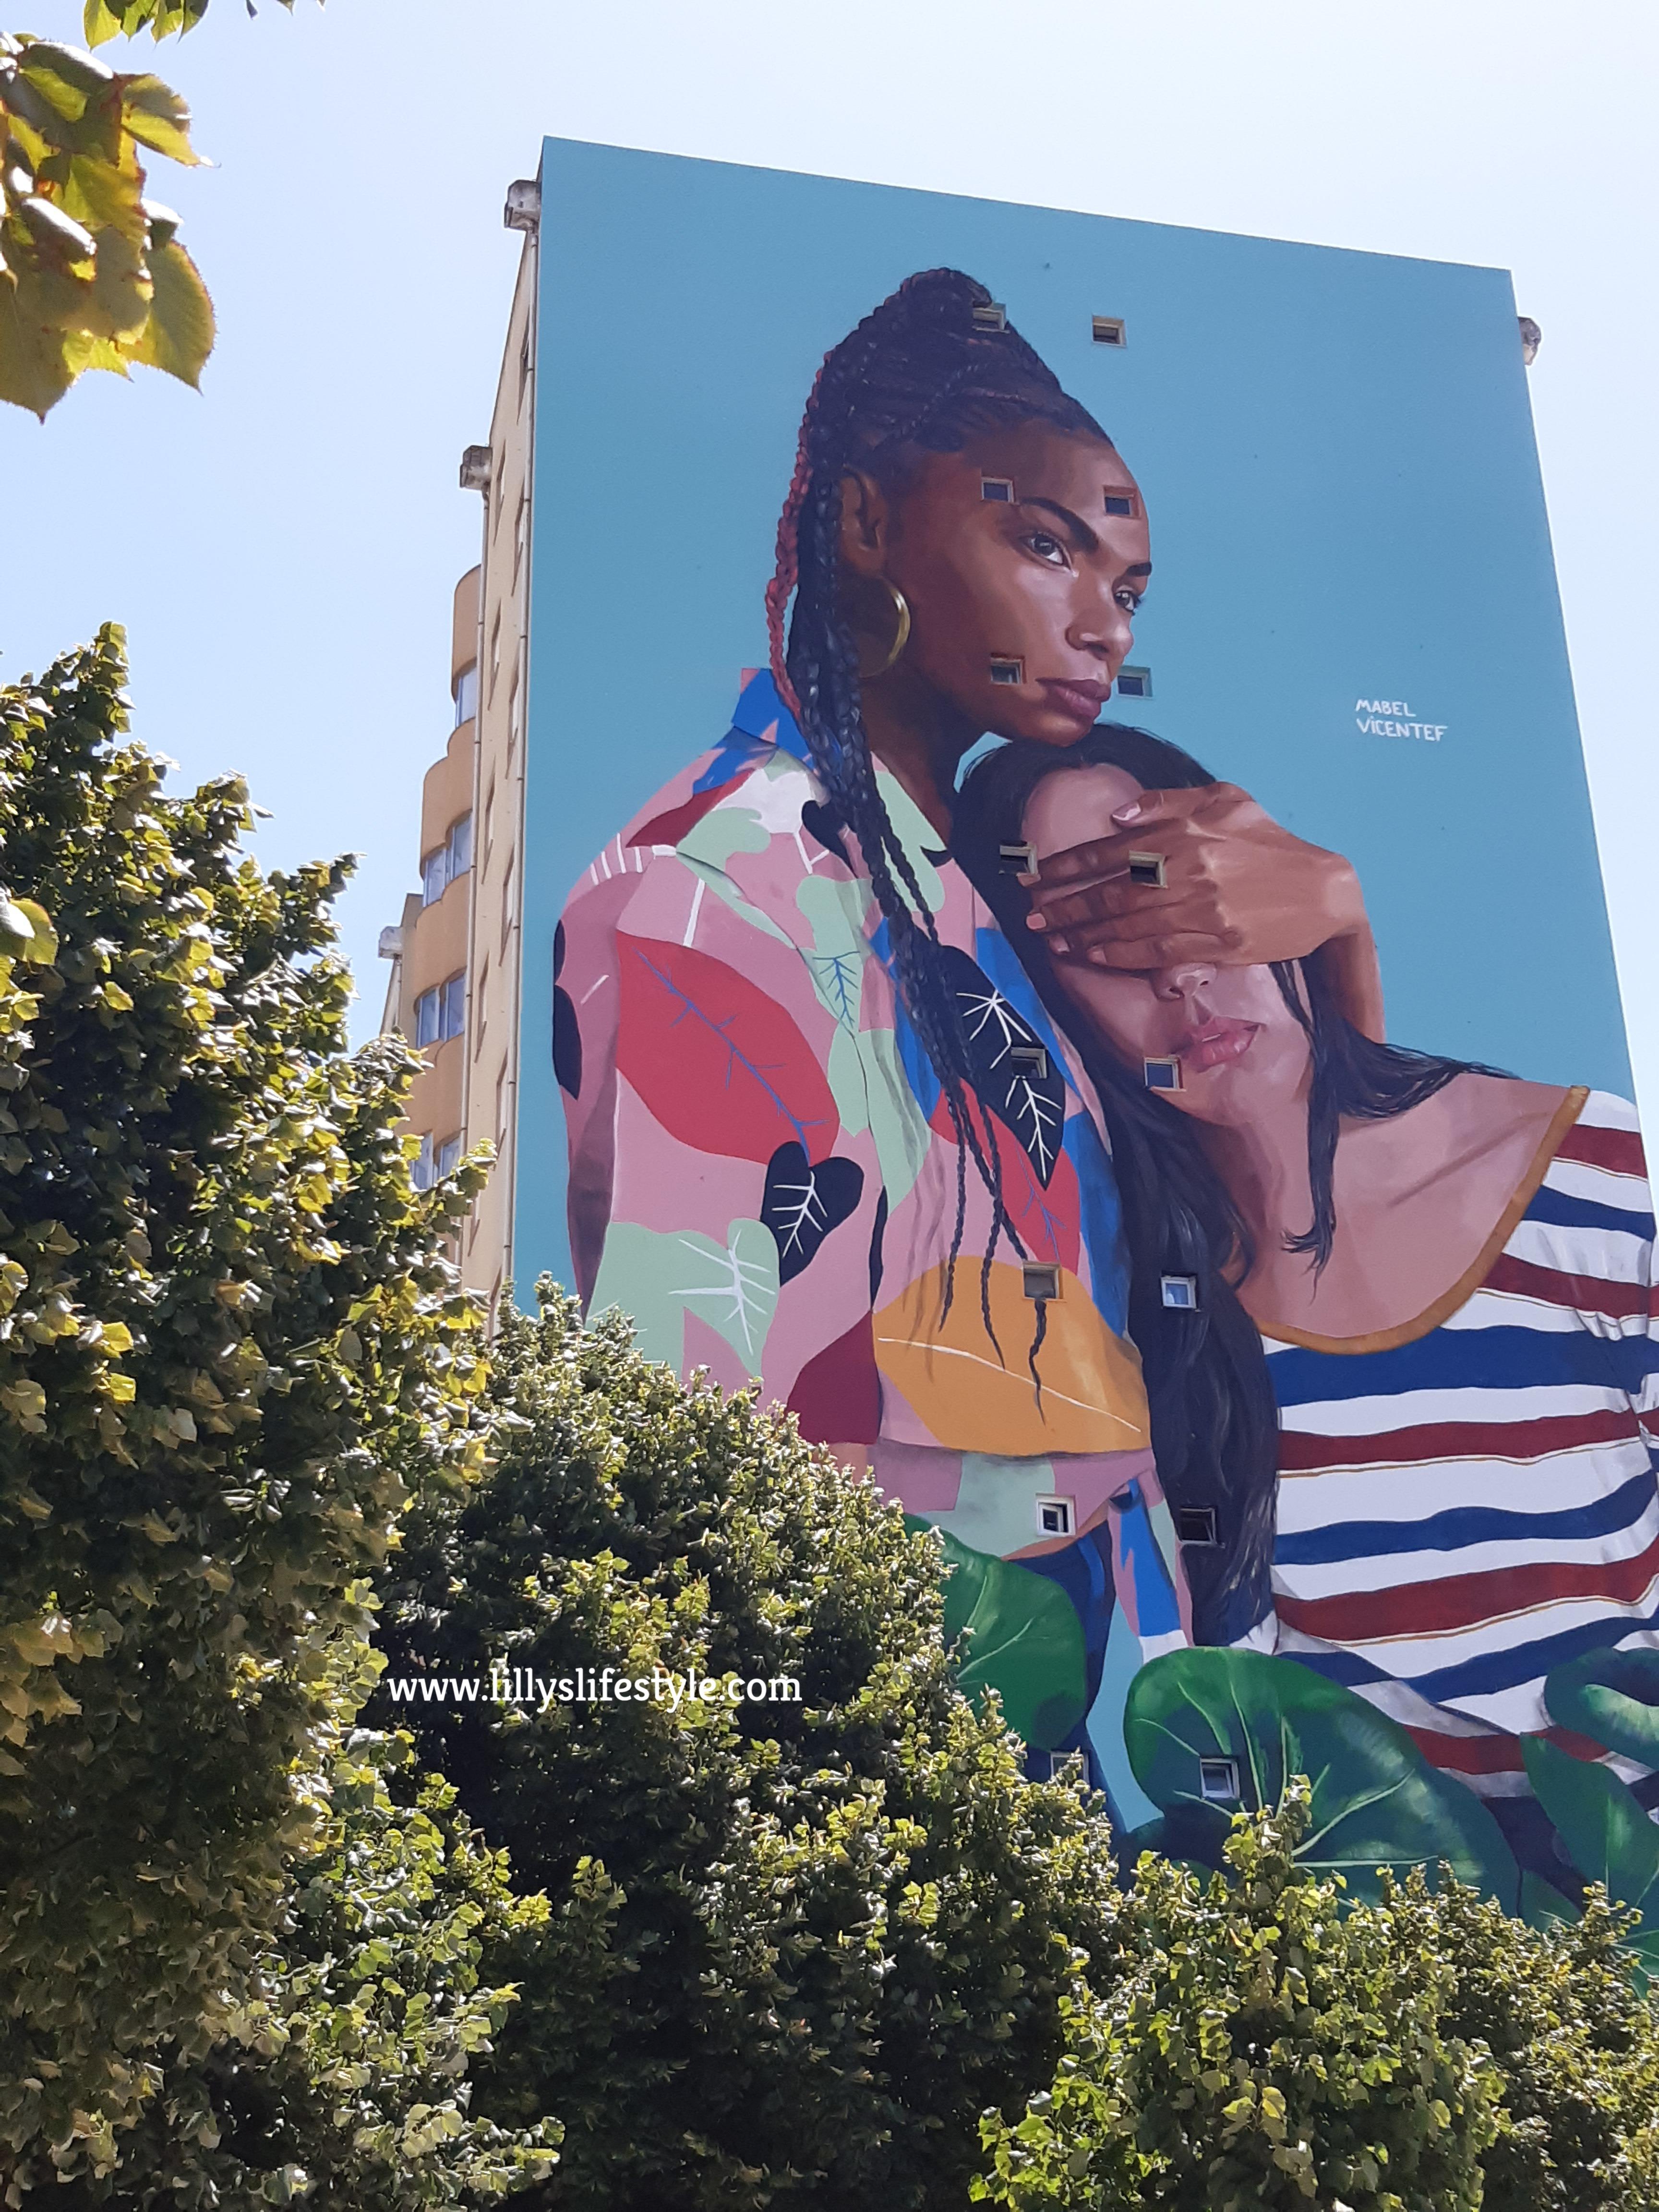 festival arte urbana lisbona